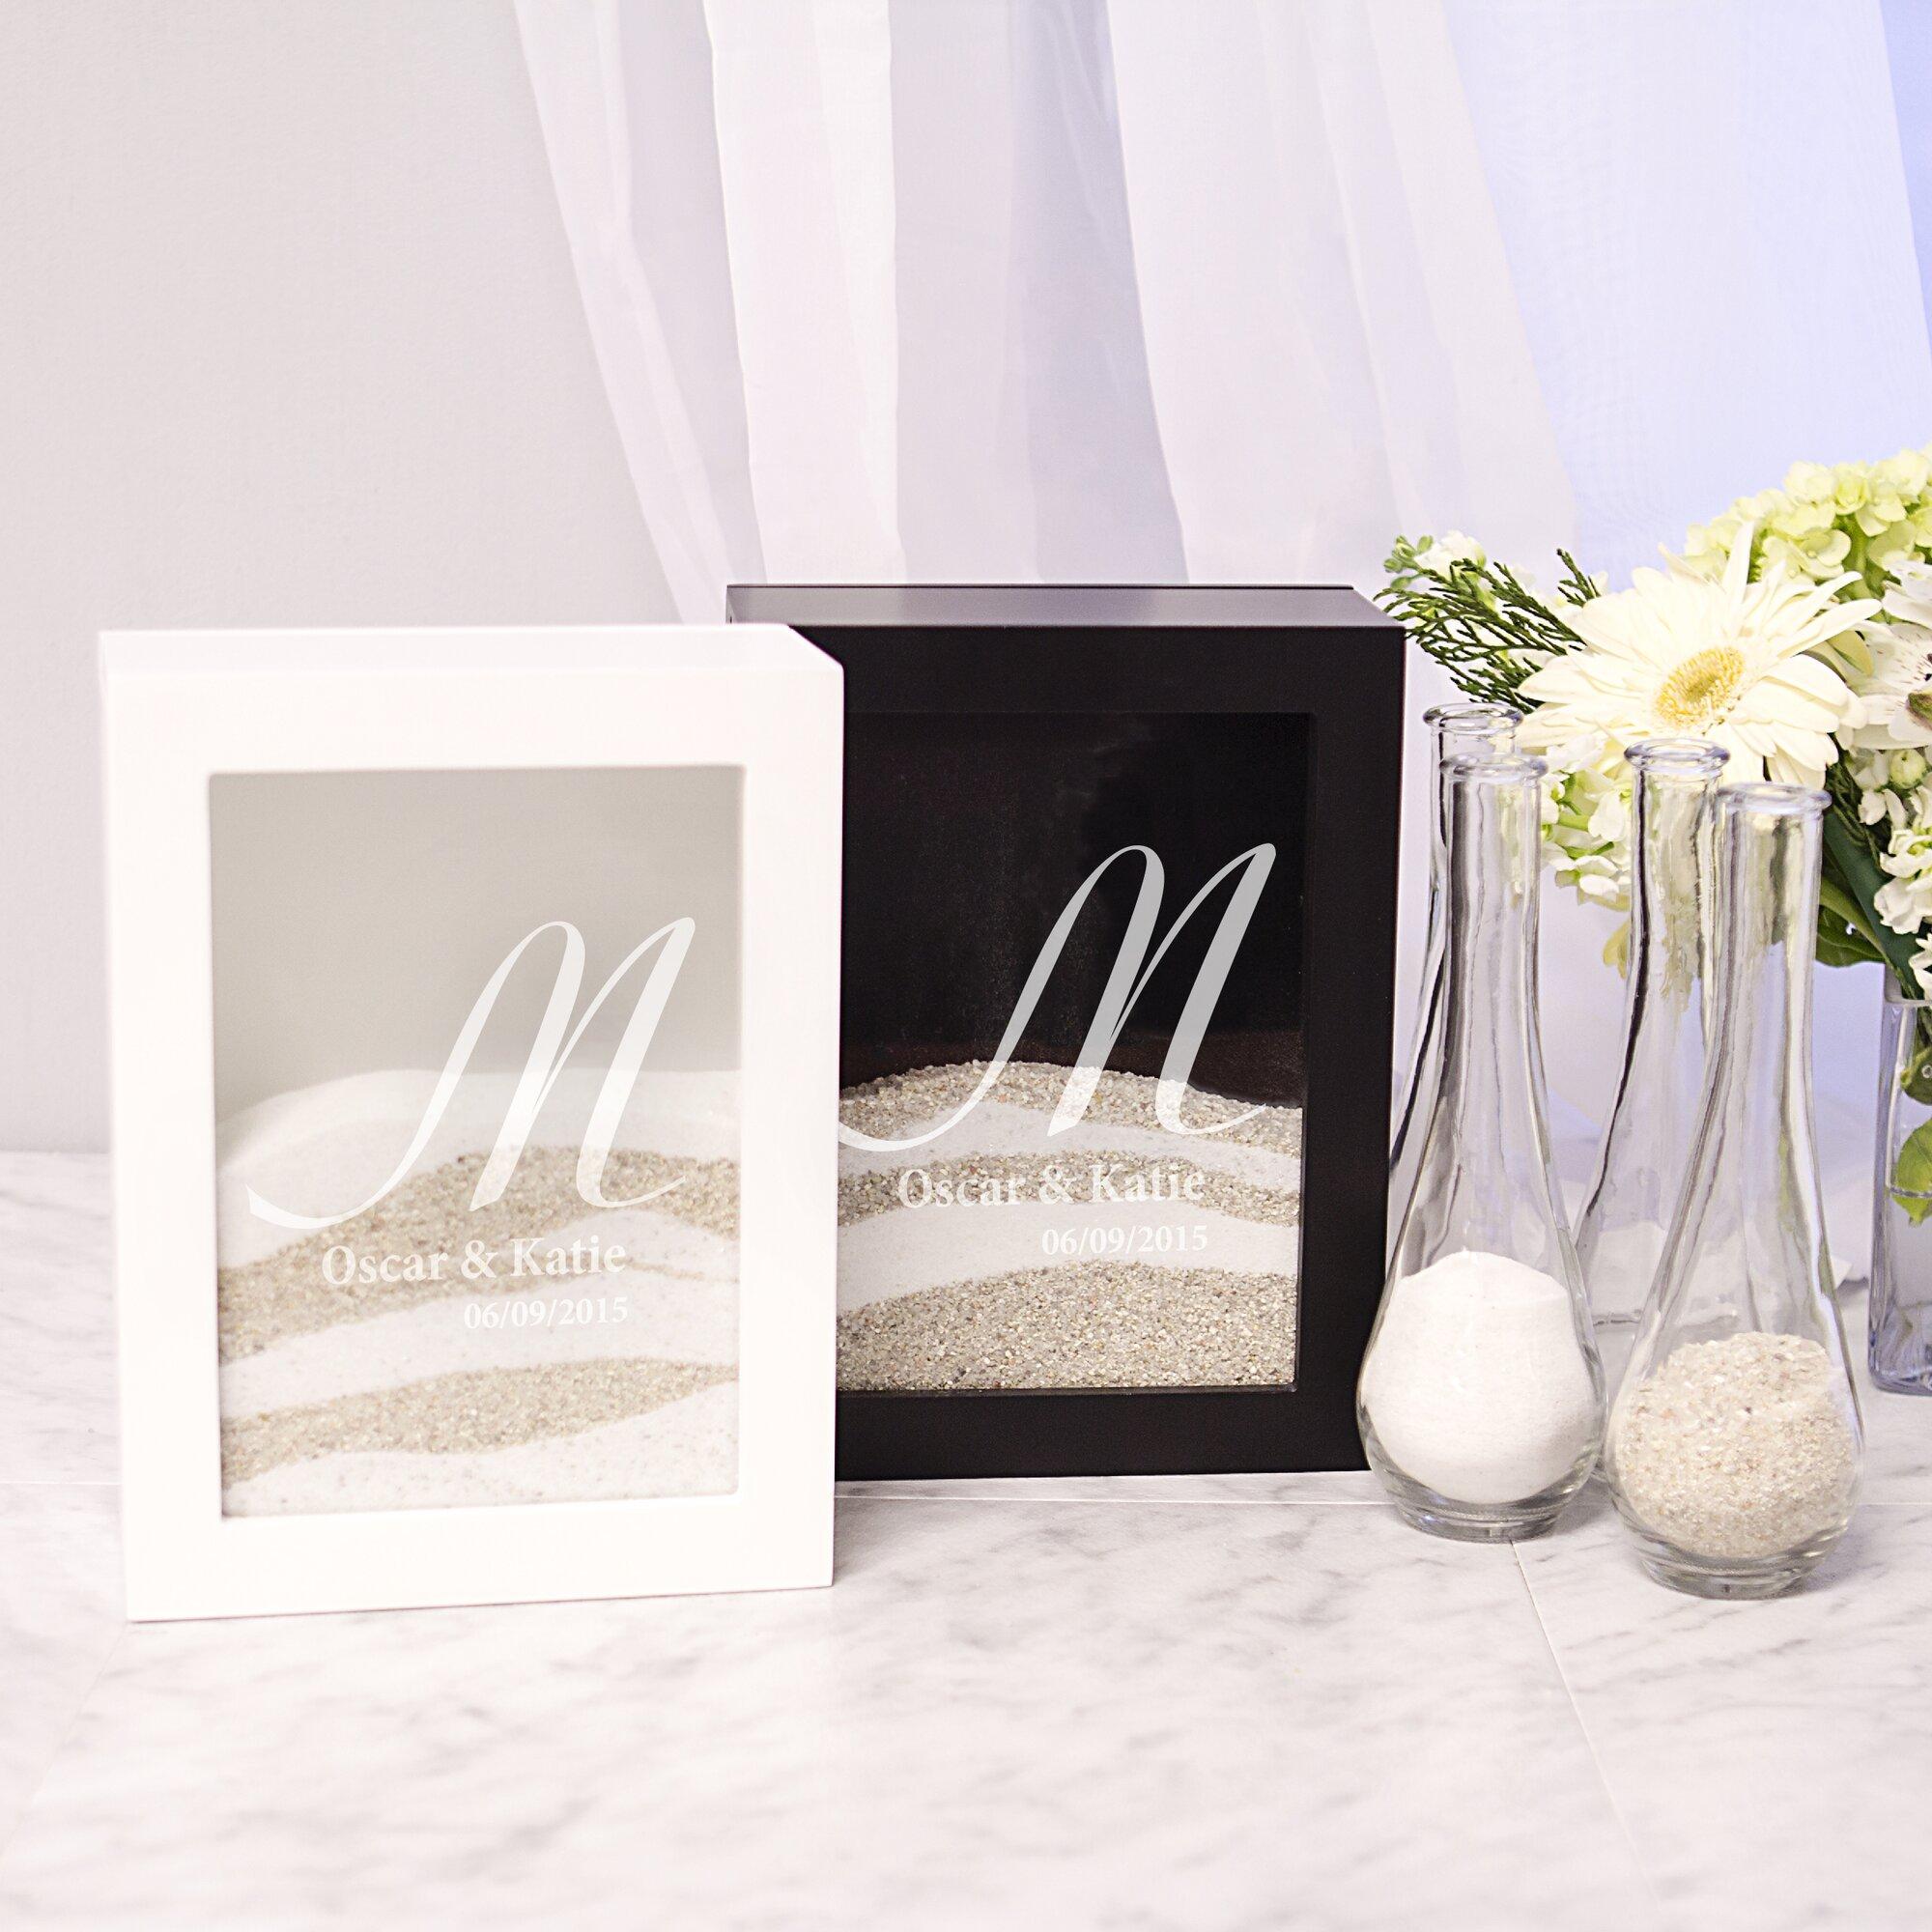 cathys concepts wedding unity sand ceremony shadow box set